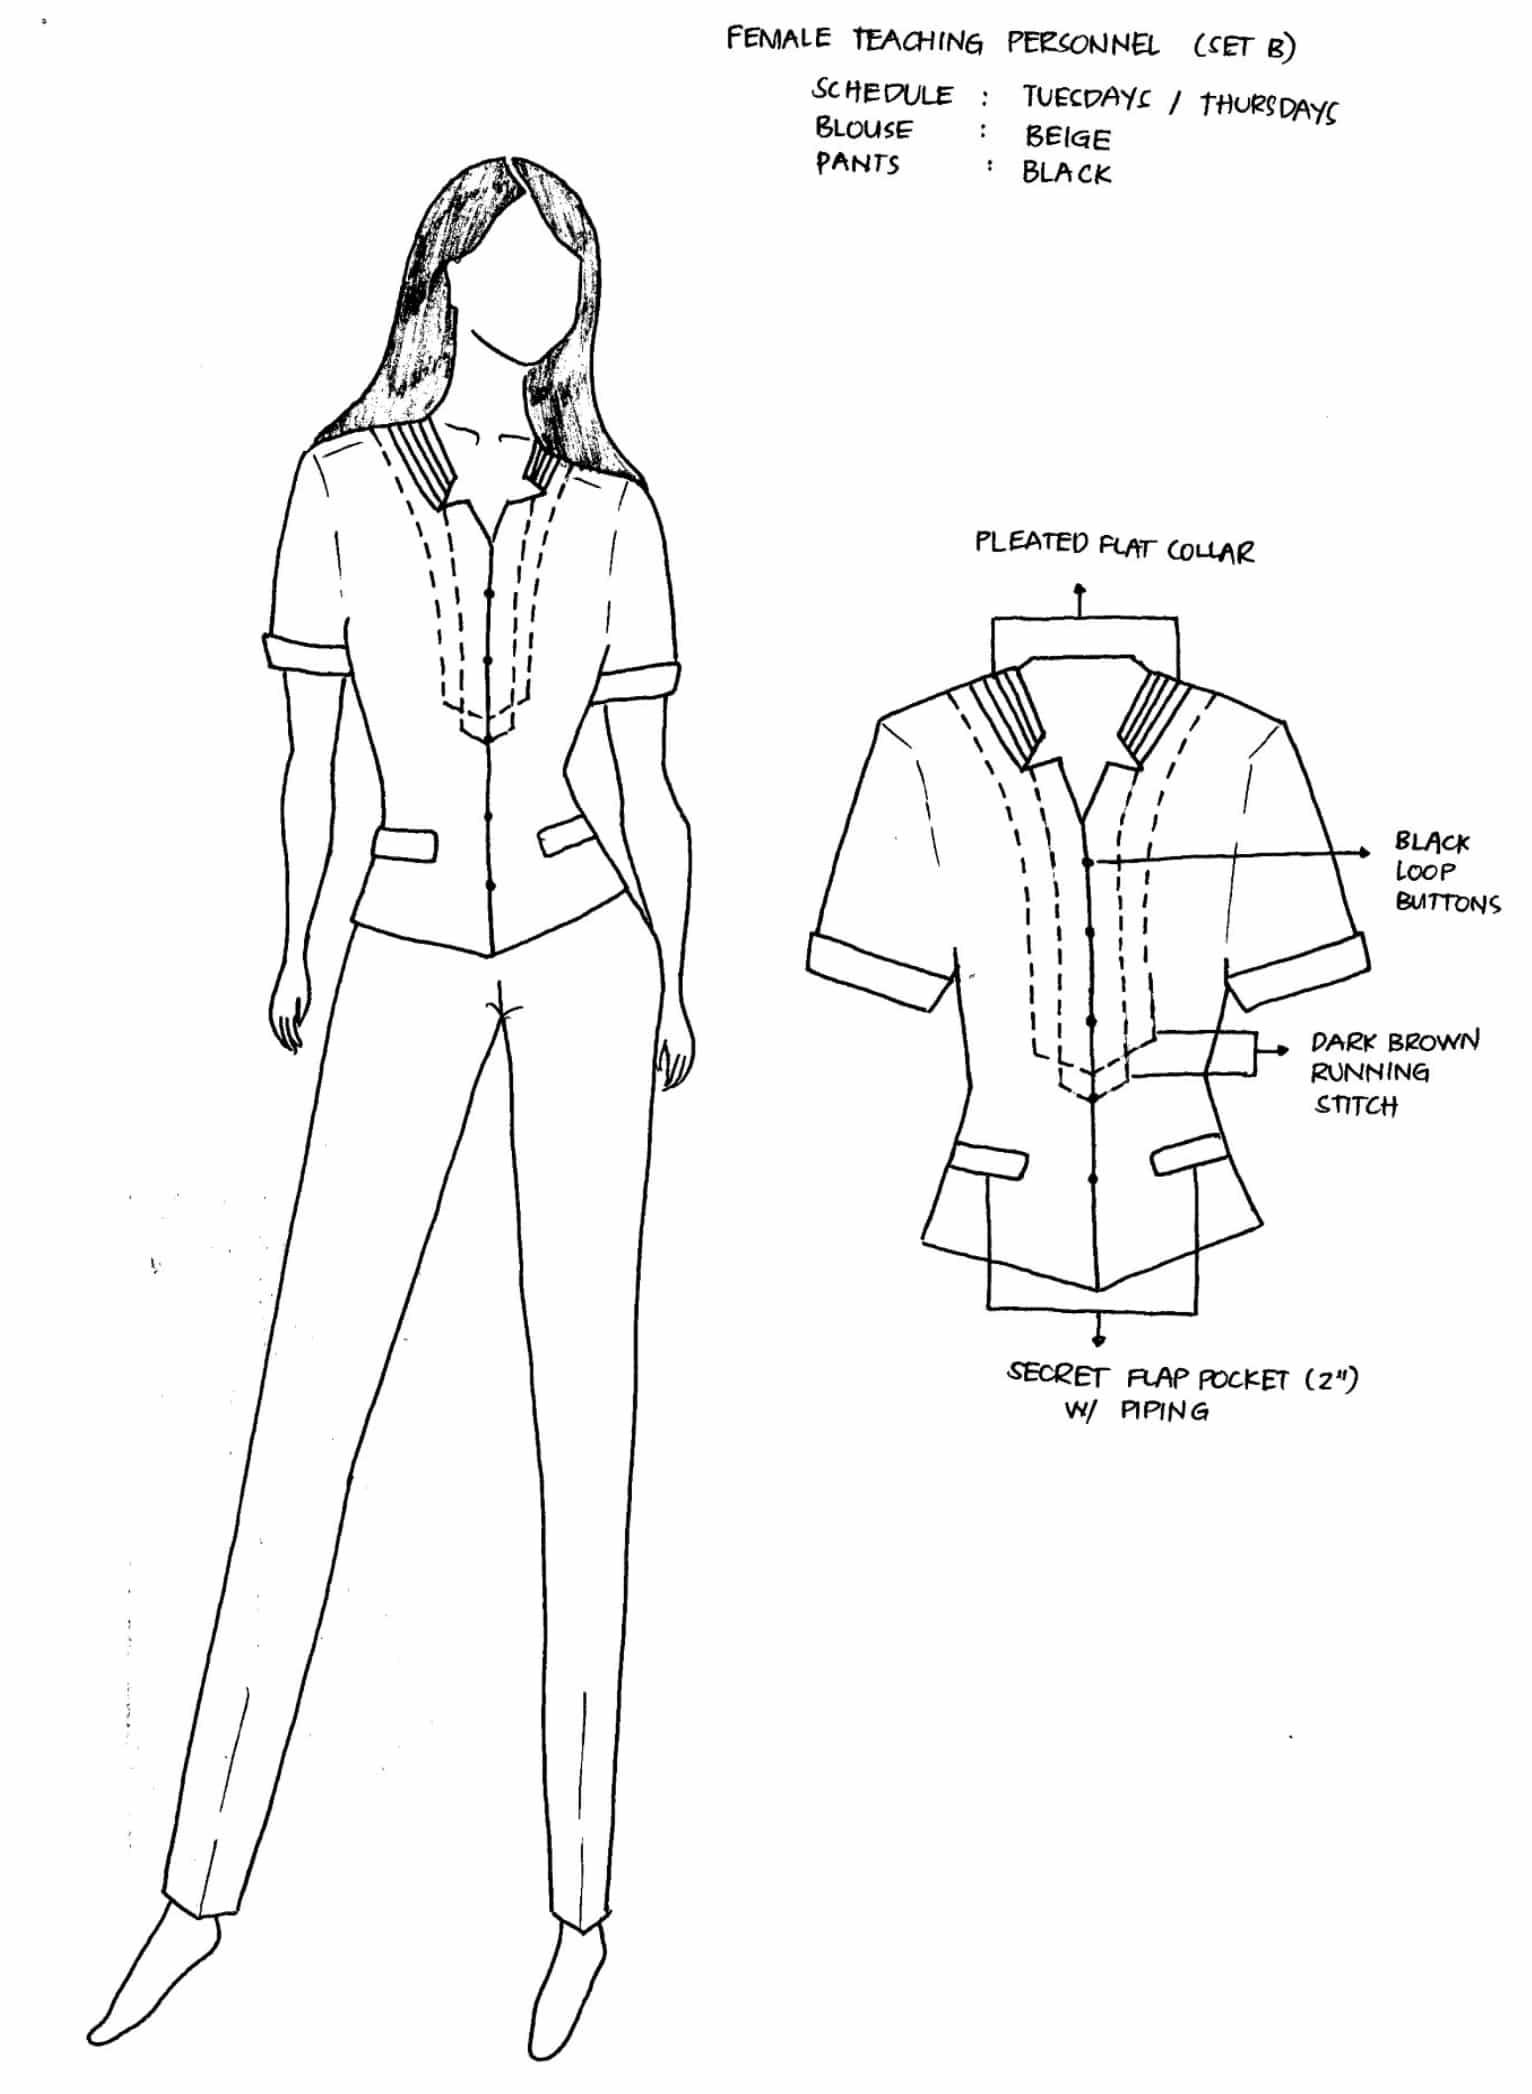 DepEd National Uniforms Female Teaching Personnel Set B